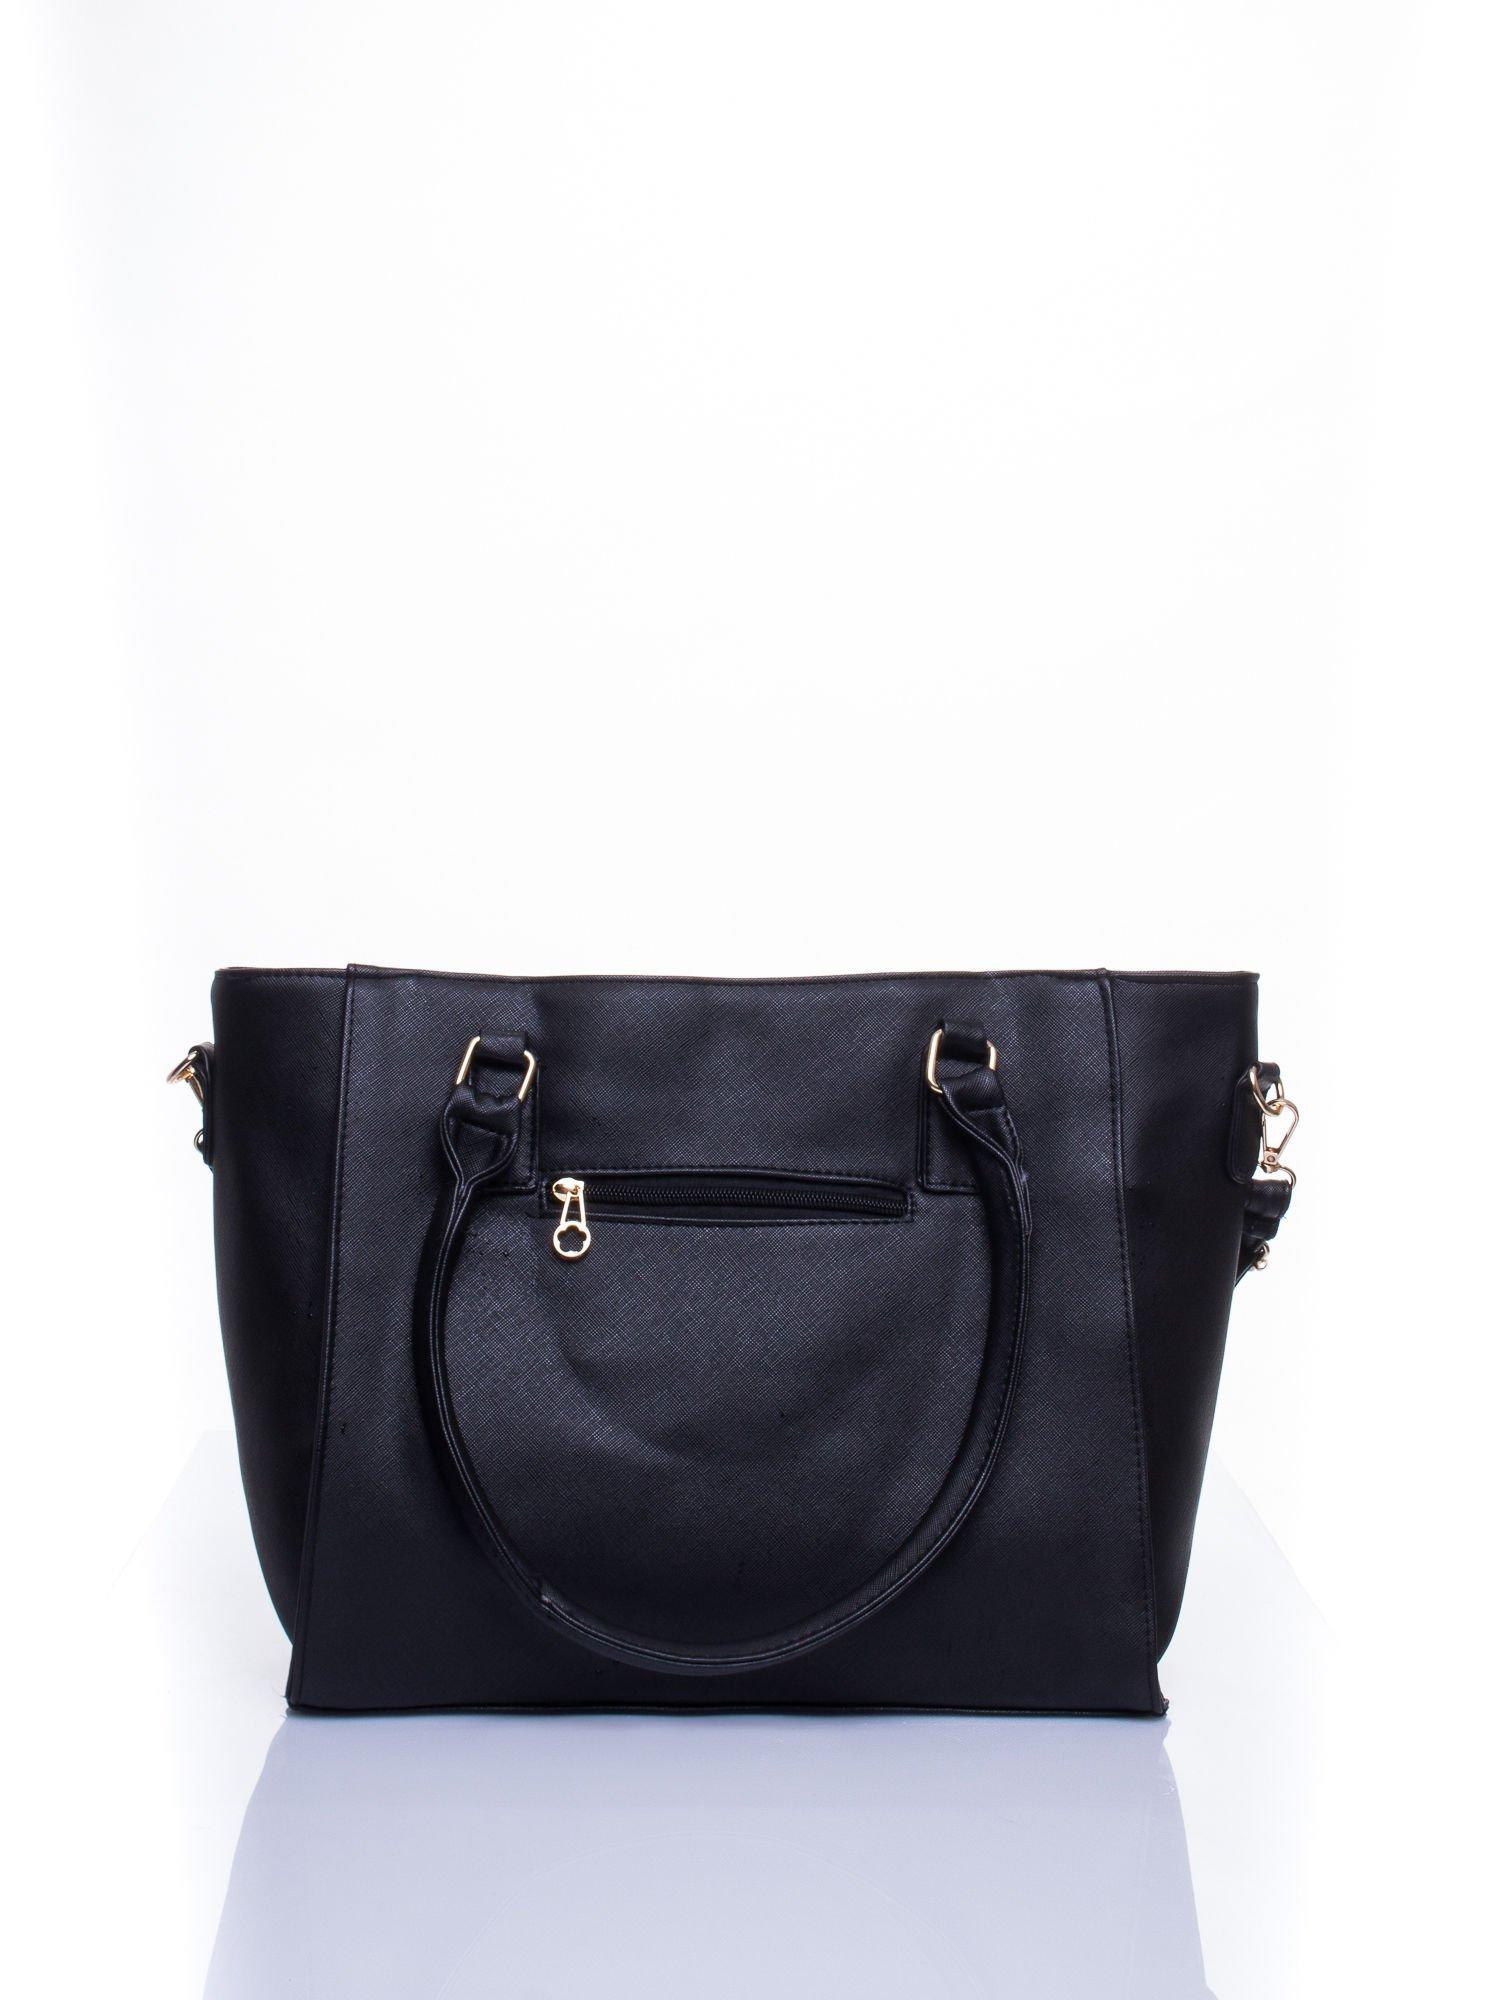 Czarna torba shopper bag z odpinanym paskiem                                  zdj.                                  4